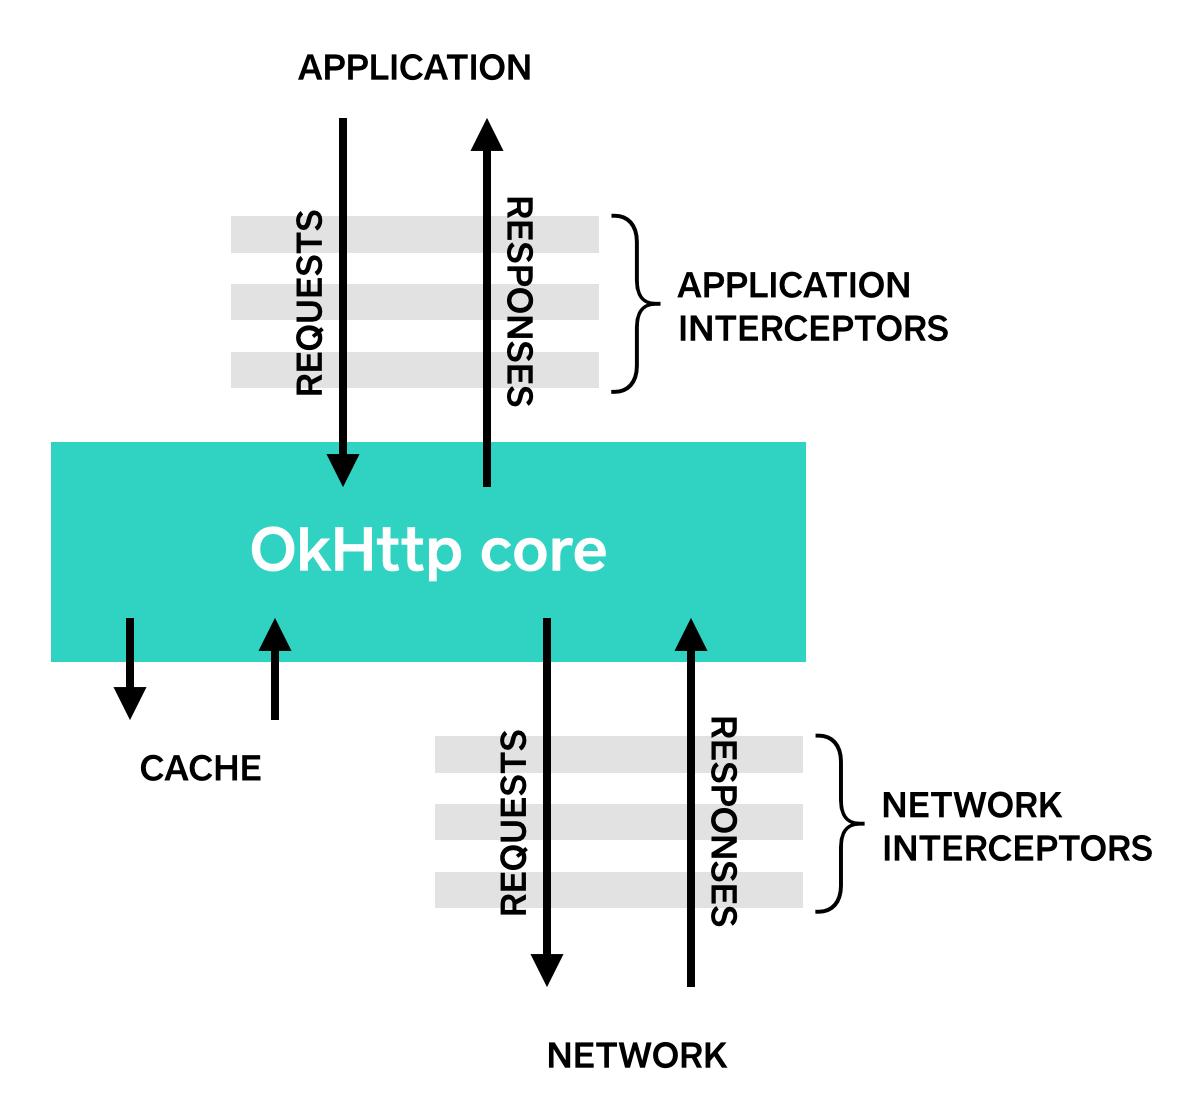 OkHttp Interceptor